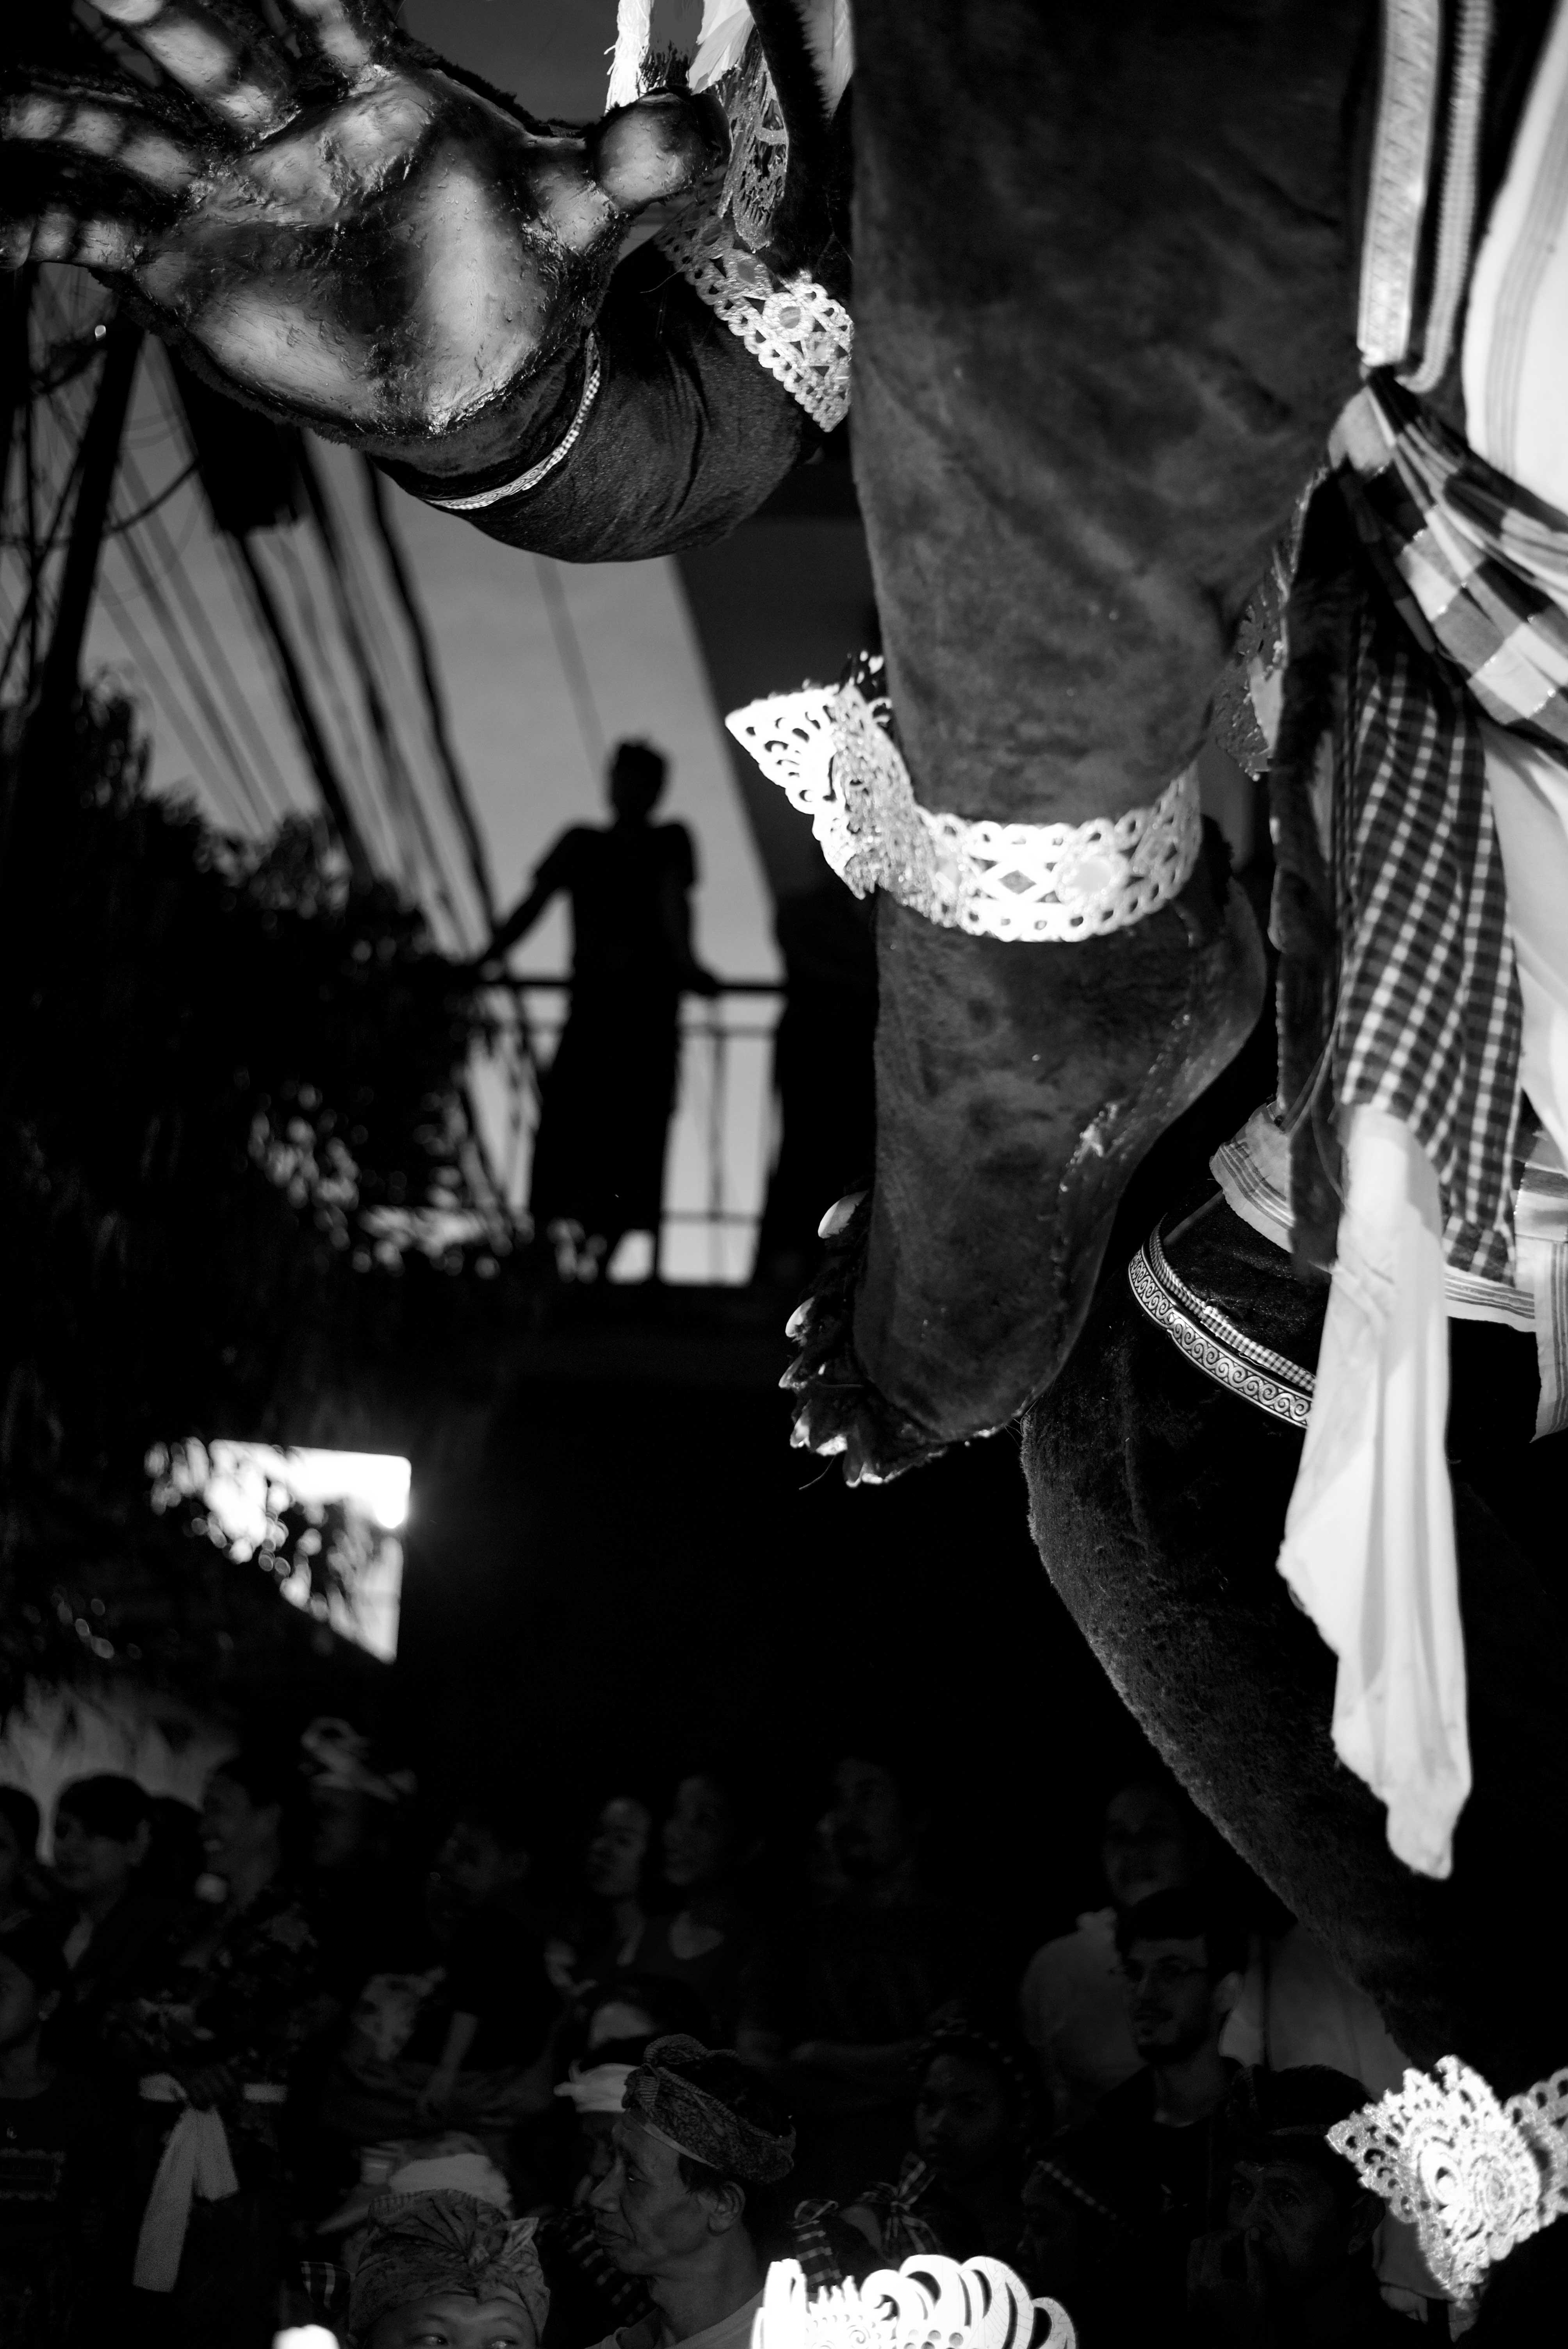 Pengerupukan - the night of Ogoh-ogoh - Bali Street Photographer